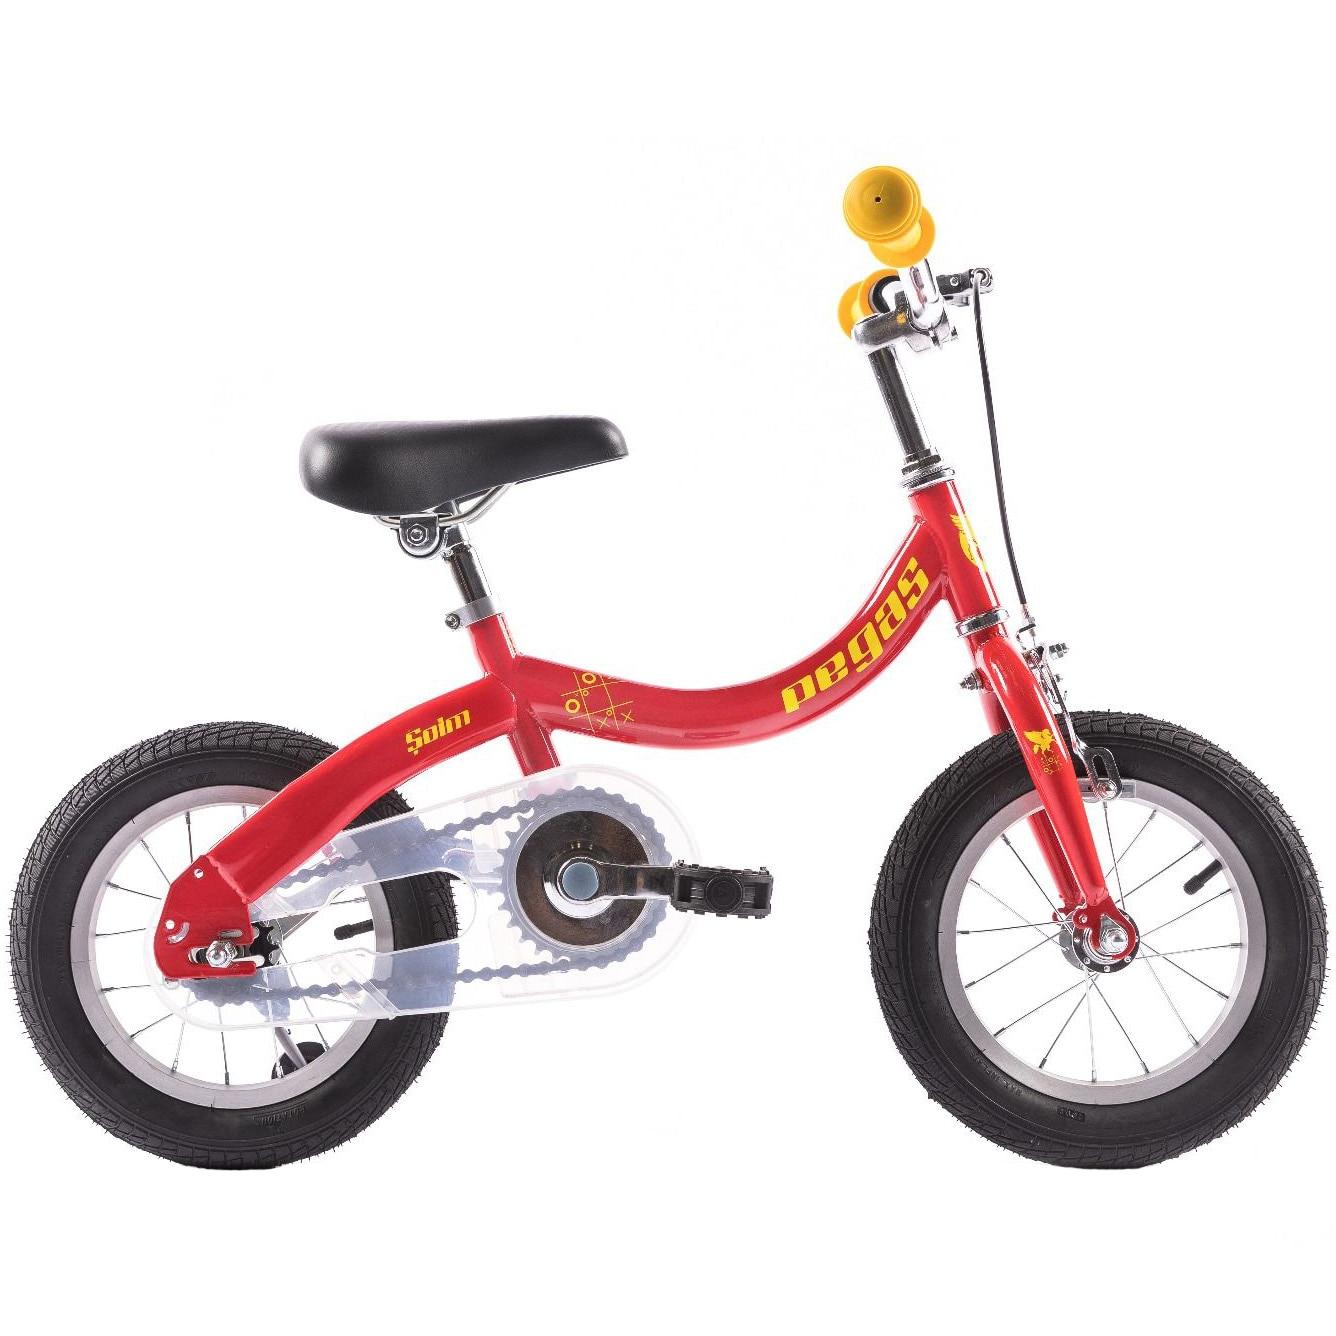 "Fotografie Bicicleta Pegas Soim EV 12"", 2in1 pentru copii, Rosu"